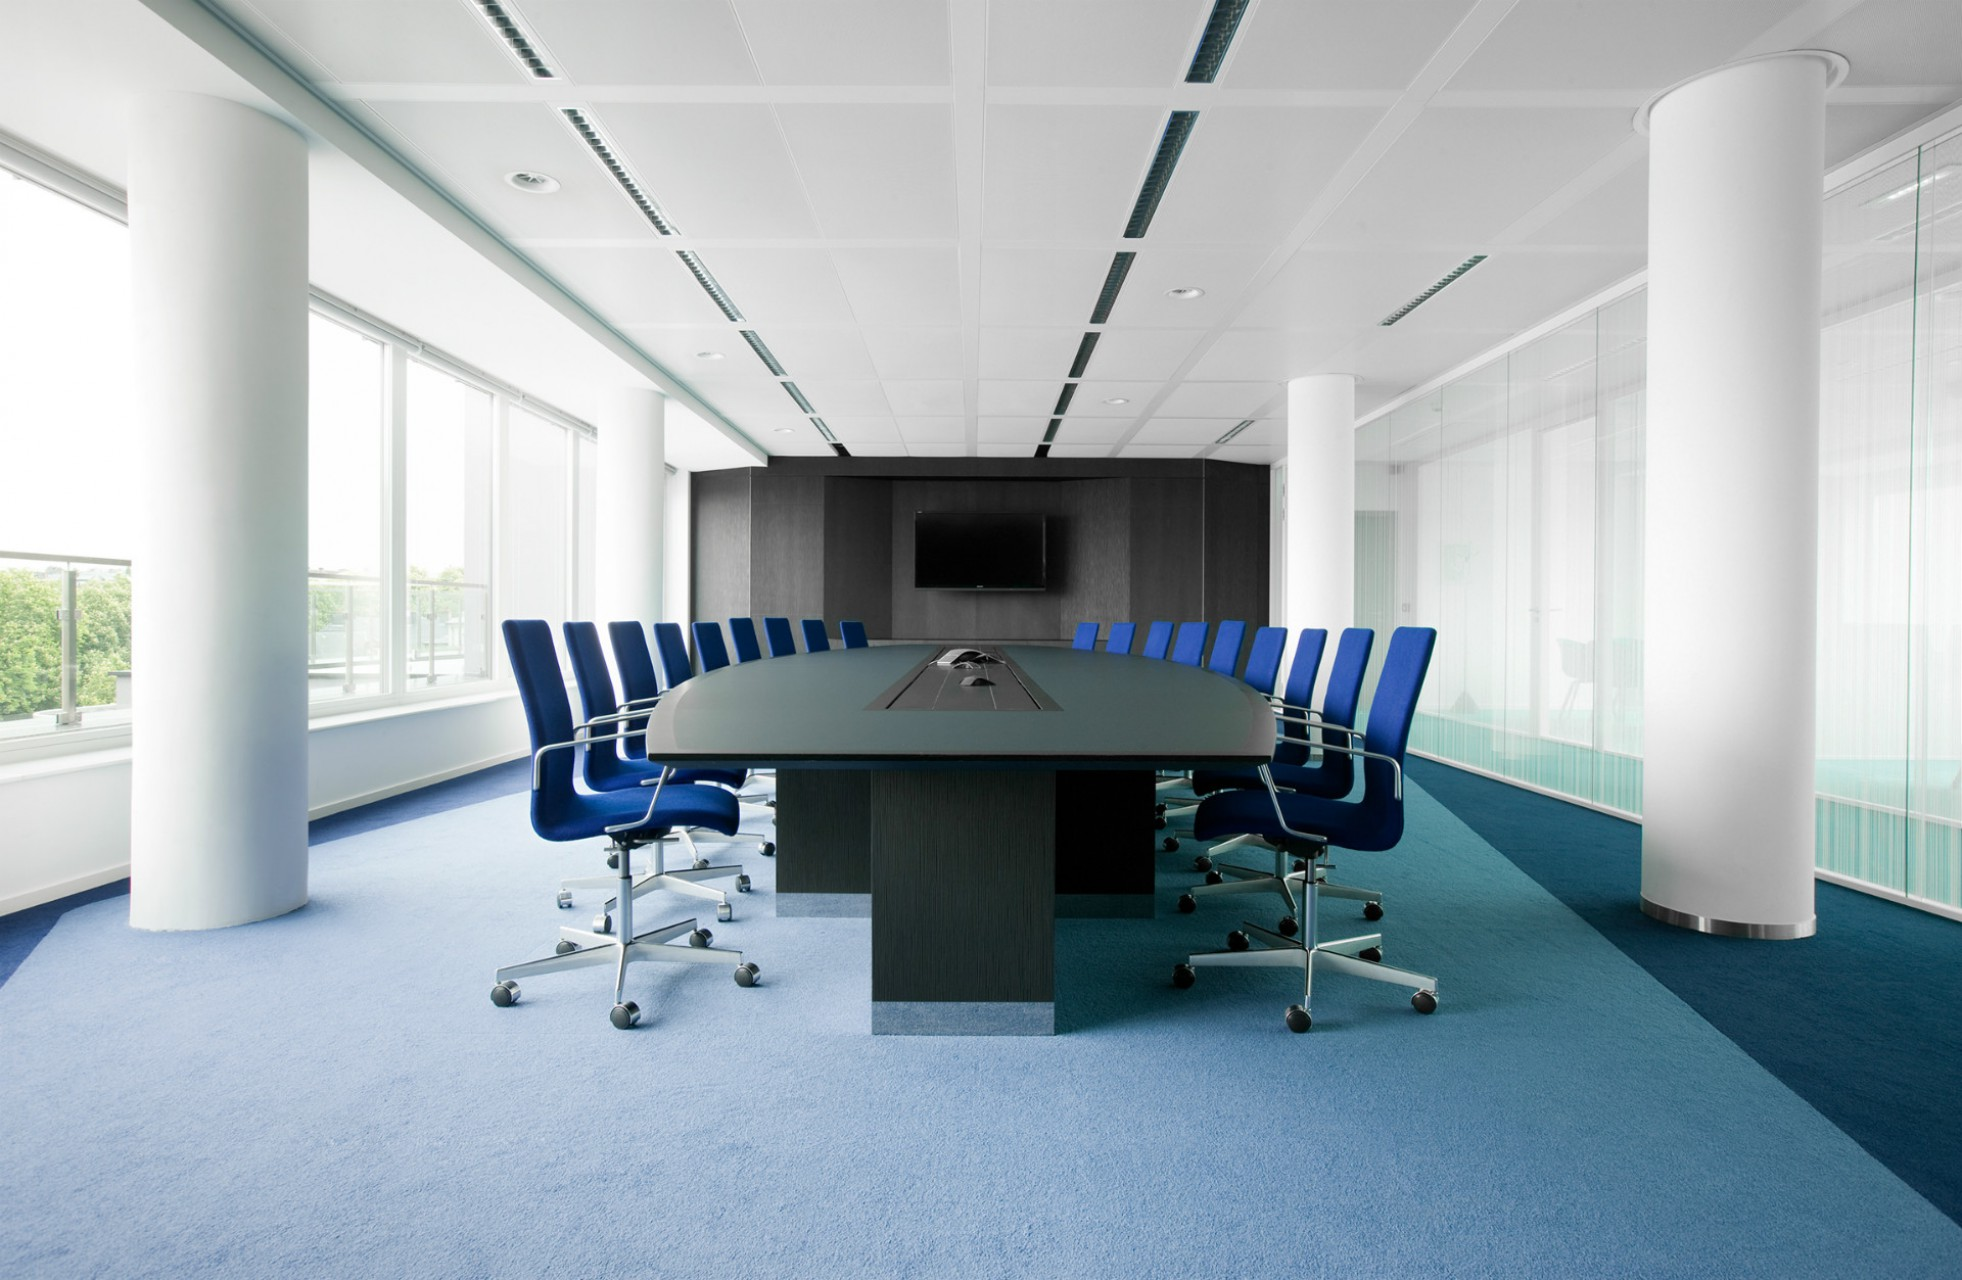 AVANTGAND - Lieven Dirckx: Office project located in  luxembourg.